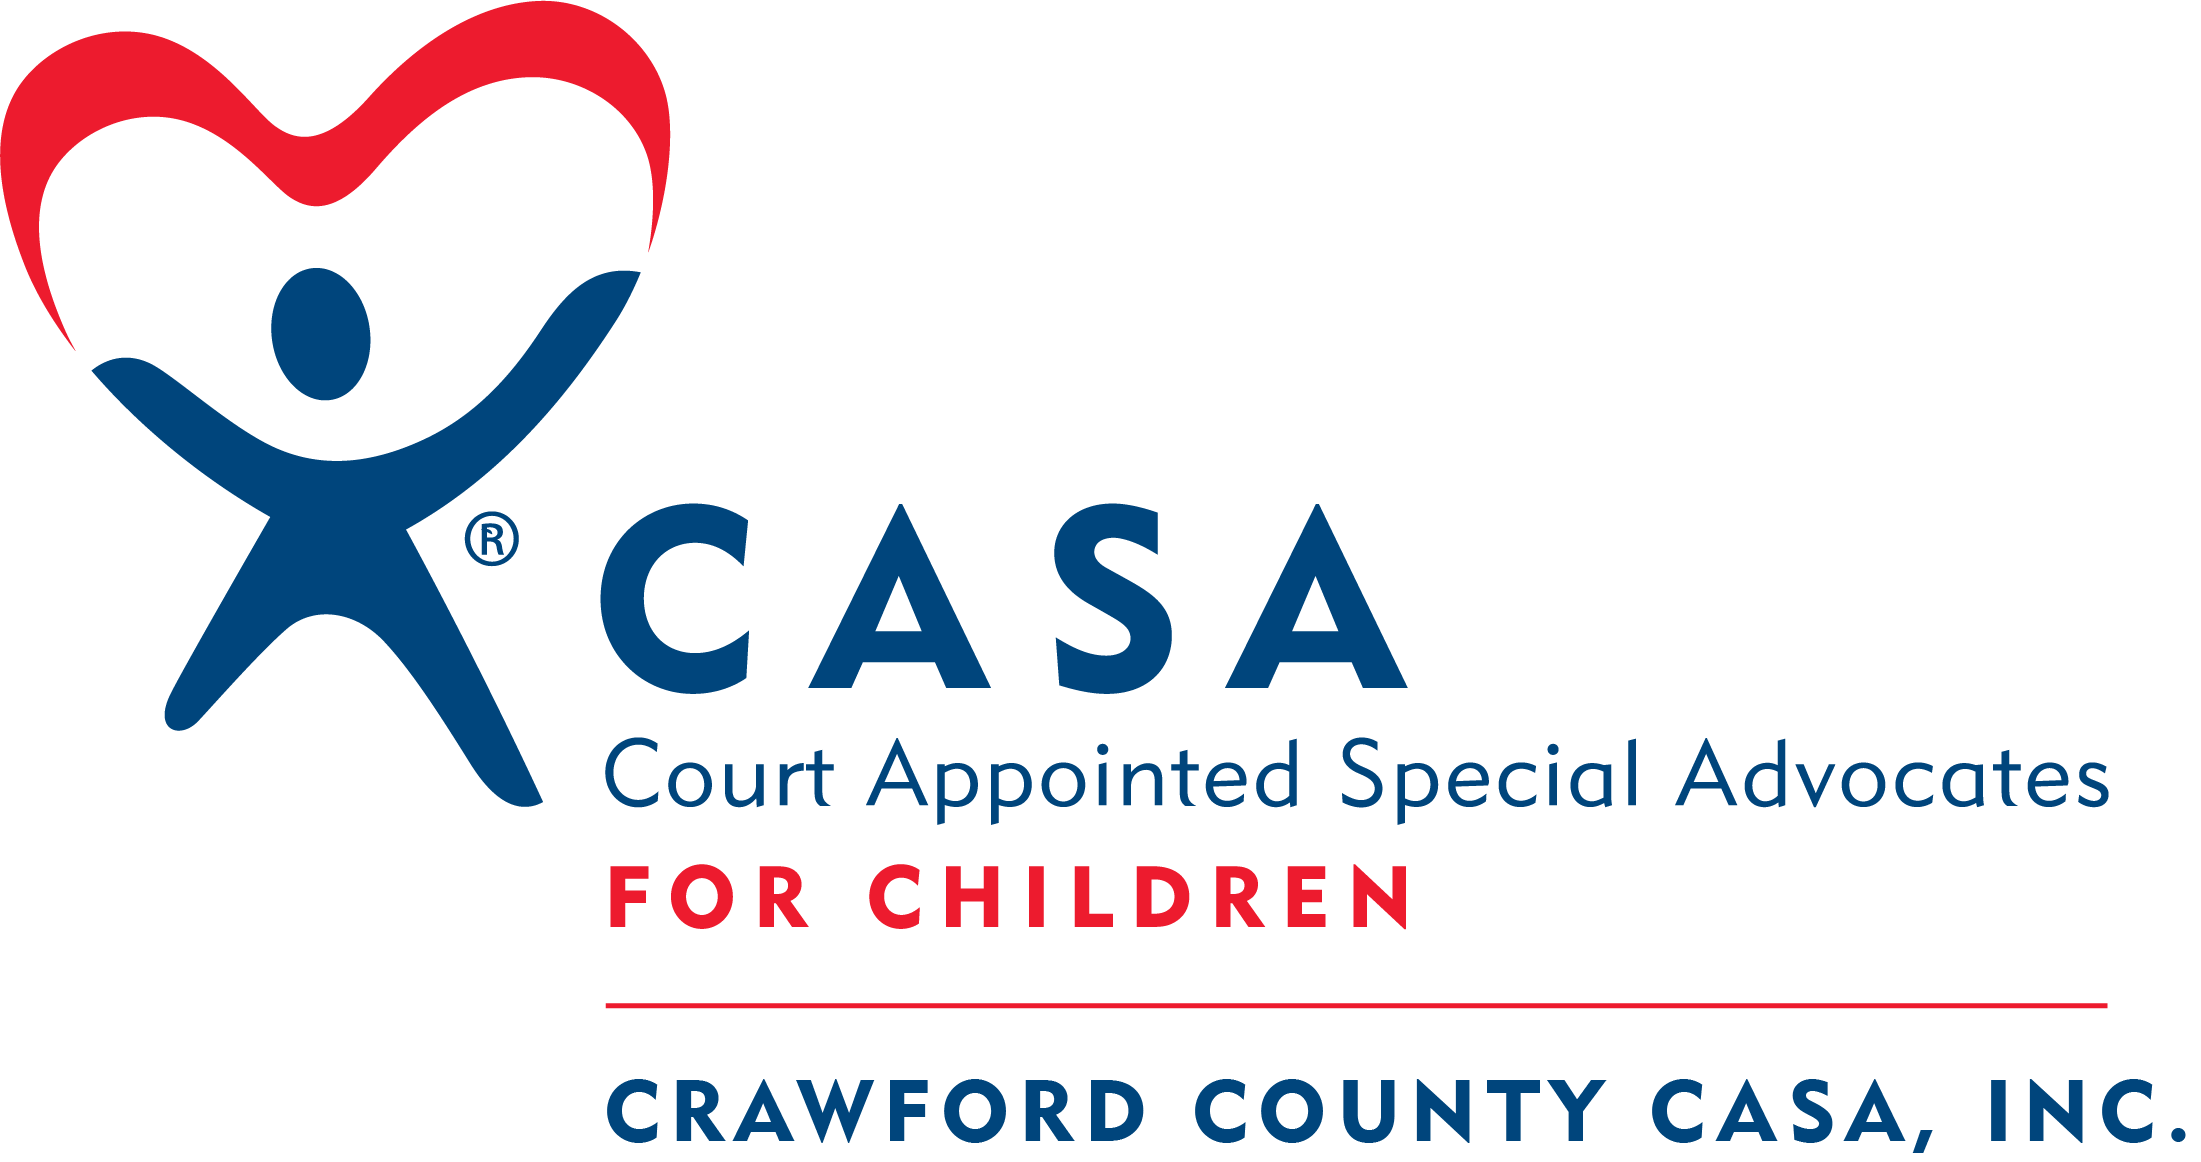 Crawford County CASA